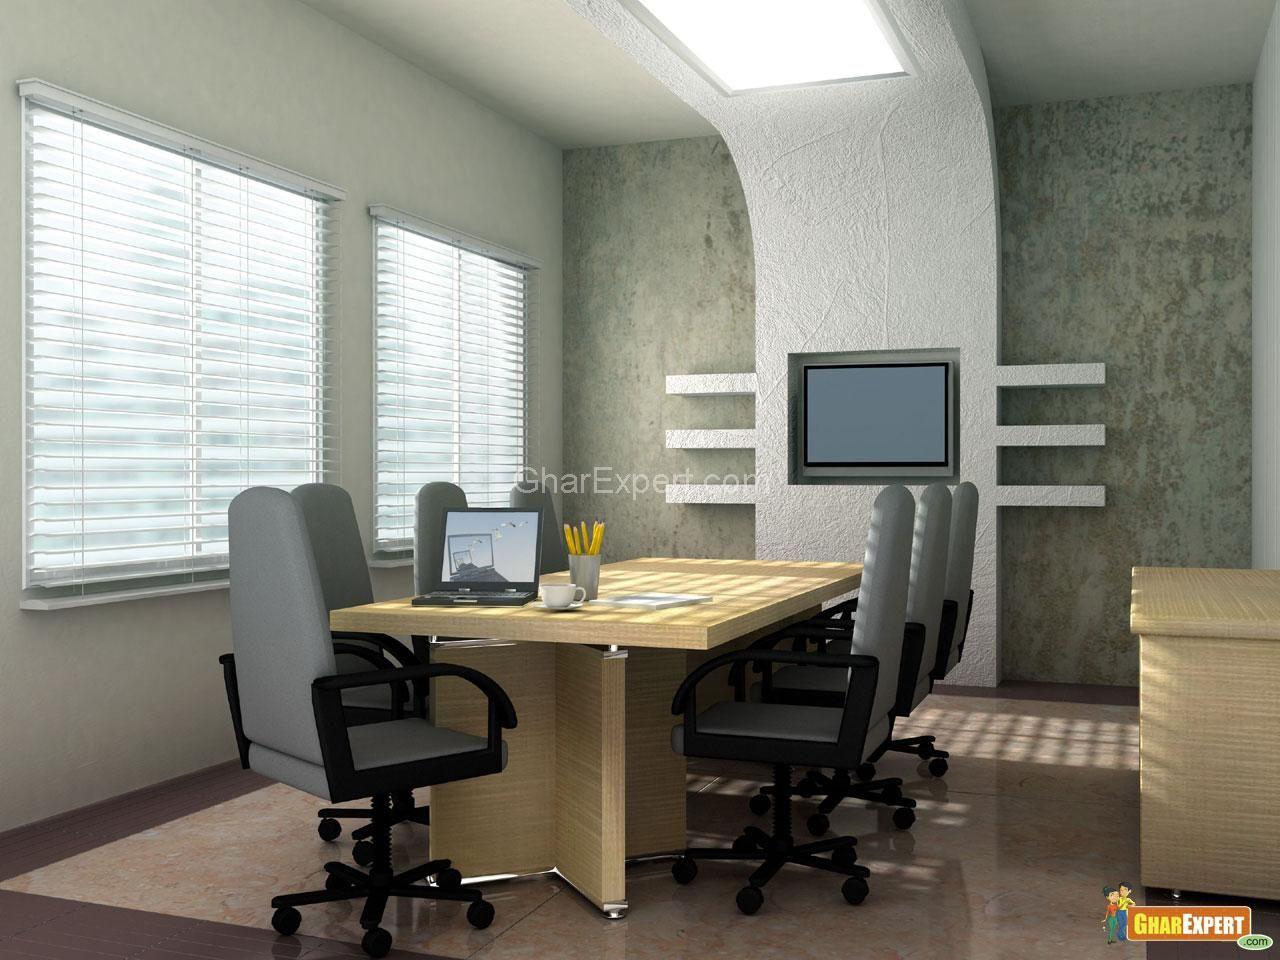 Bedroommoderncontemporaryofficemeetingroomdesignwithwall - Bedroom design concepts